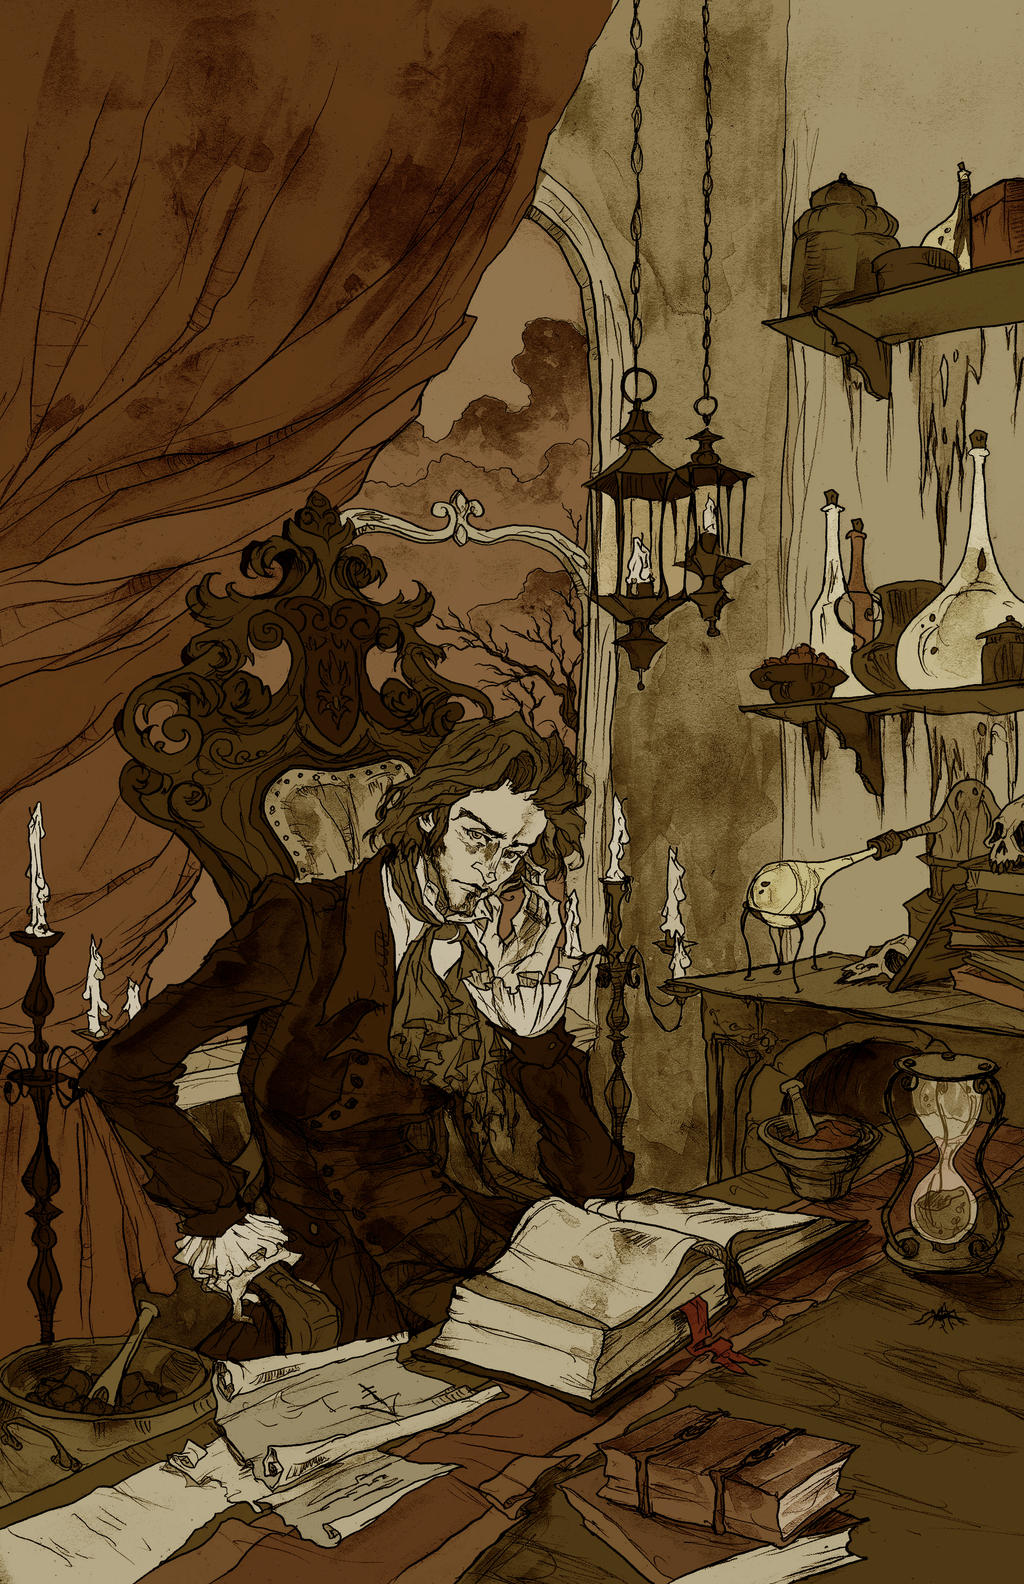 http://fc09.deviantart.net/fs70/i/2011/307/e/0/the_alchemist_by_mirrorcradle-d4ekocj.jpg